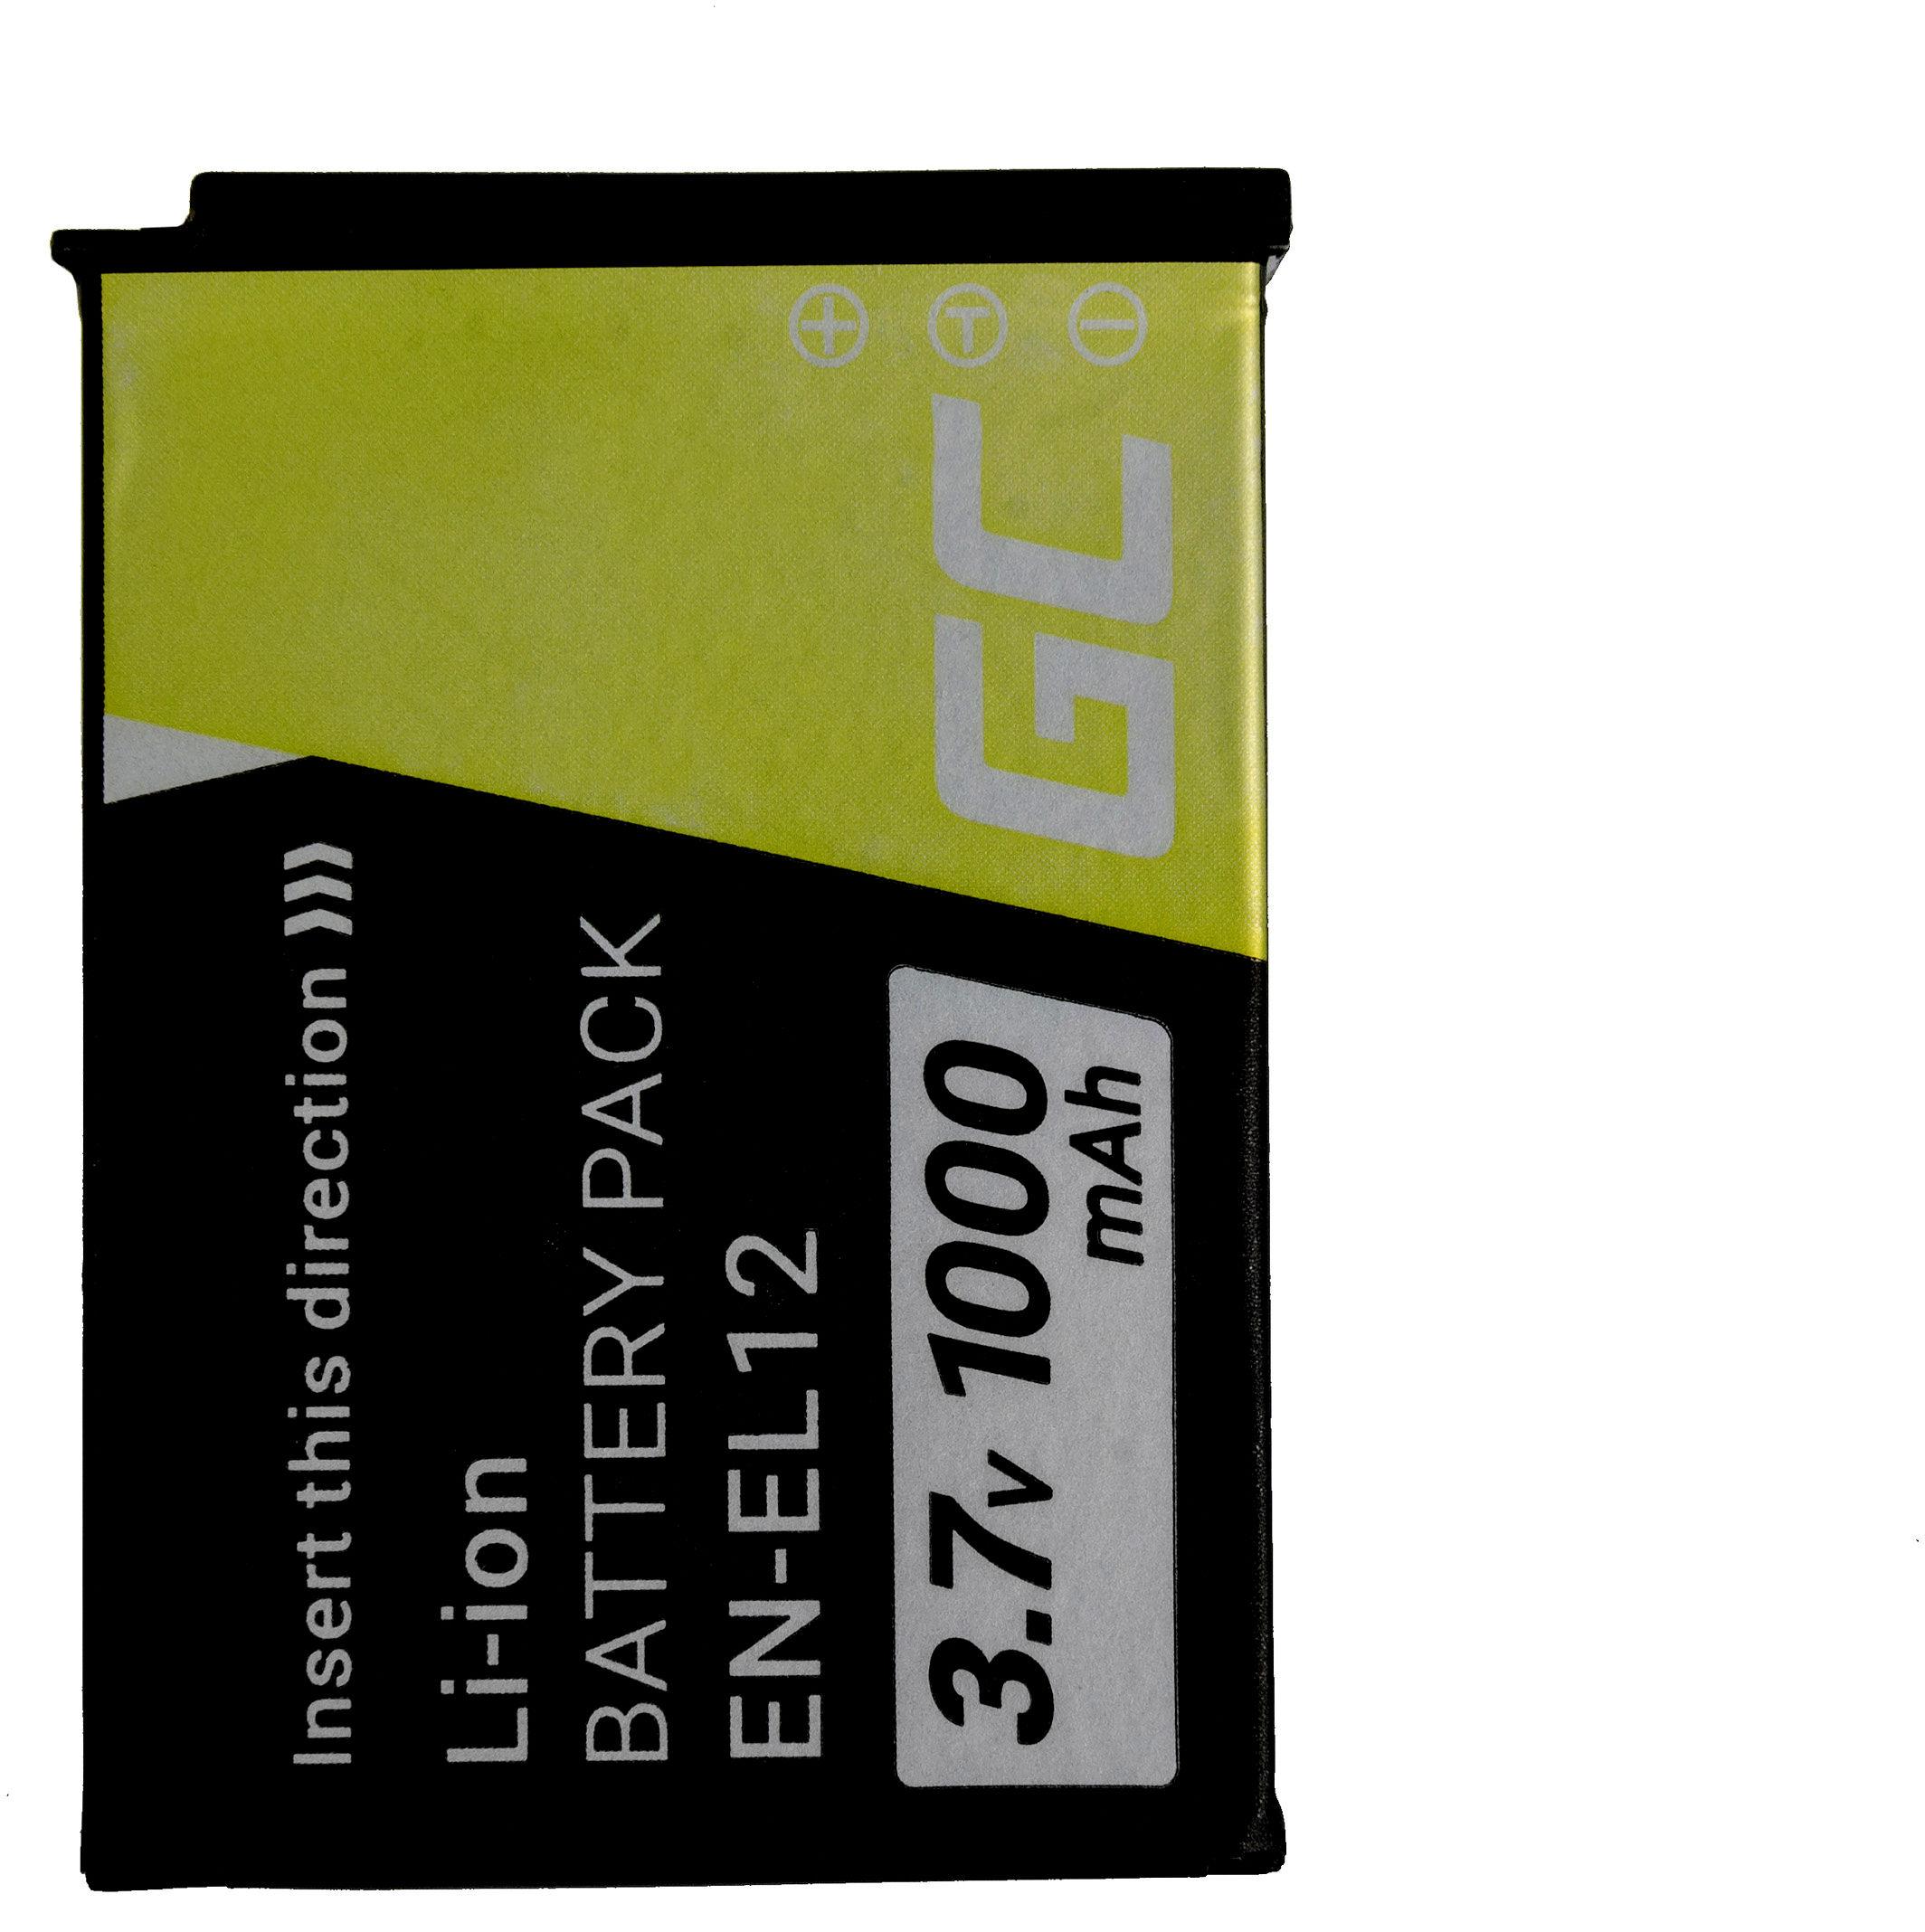 Akumulator Bateria Green Cell  EN-EL12 do Nikon Coolpix A900 AW100 AW120 AW130 P300 W300 S6200 S6300 S9100 S9300 3.7V 1000mAh